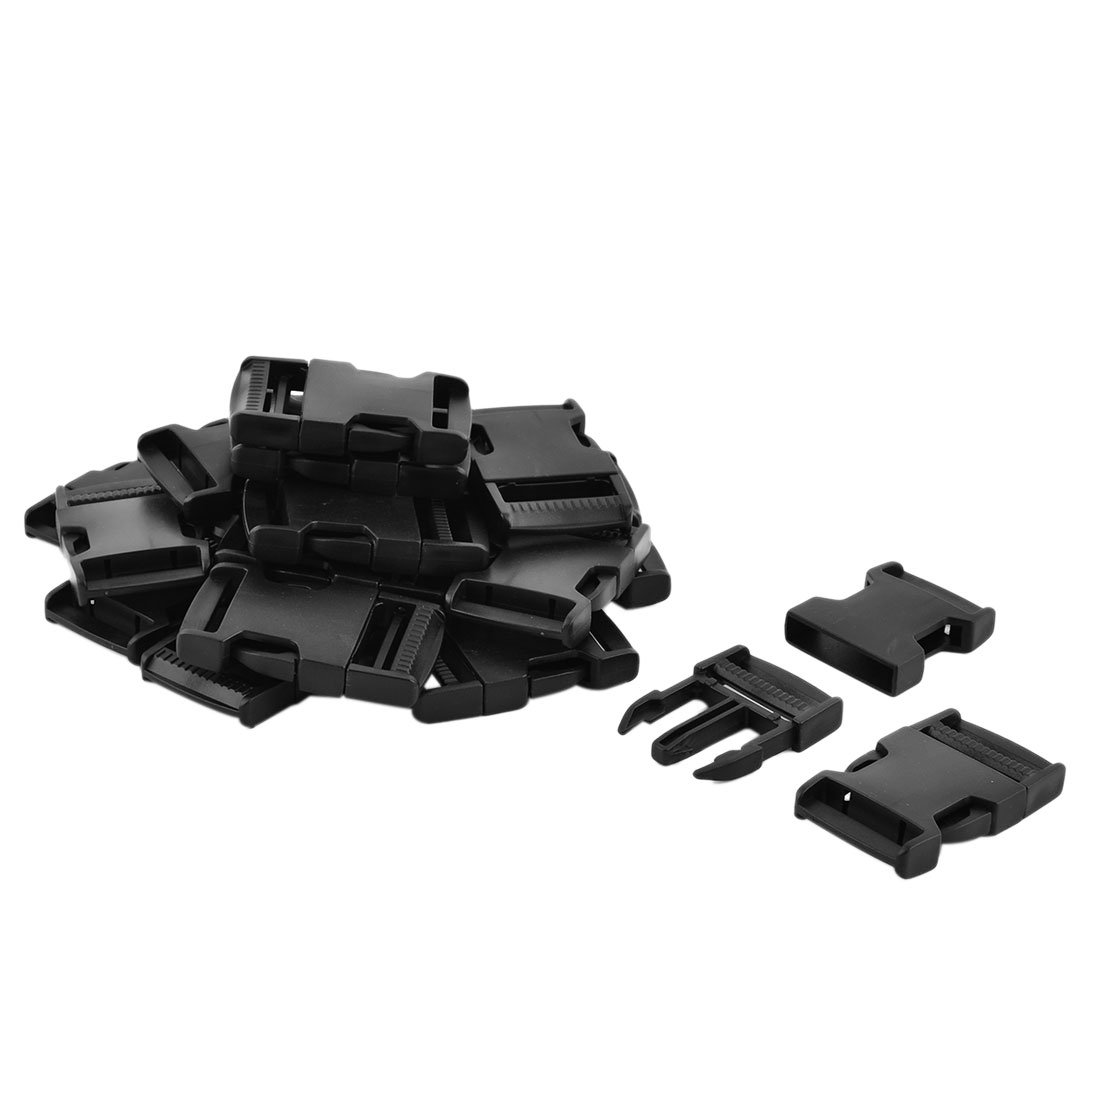 uxcell Plastic Backpack Luggage Safety Belt Side Release Buckles 6.7cm Long 20pcs Black